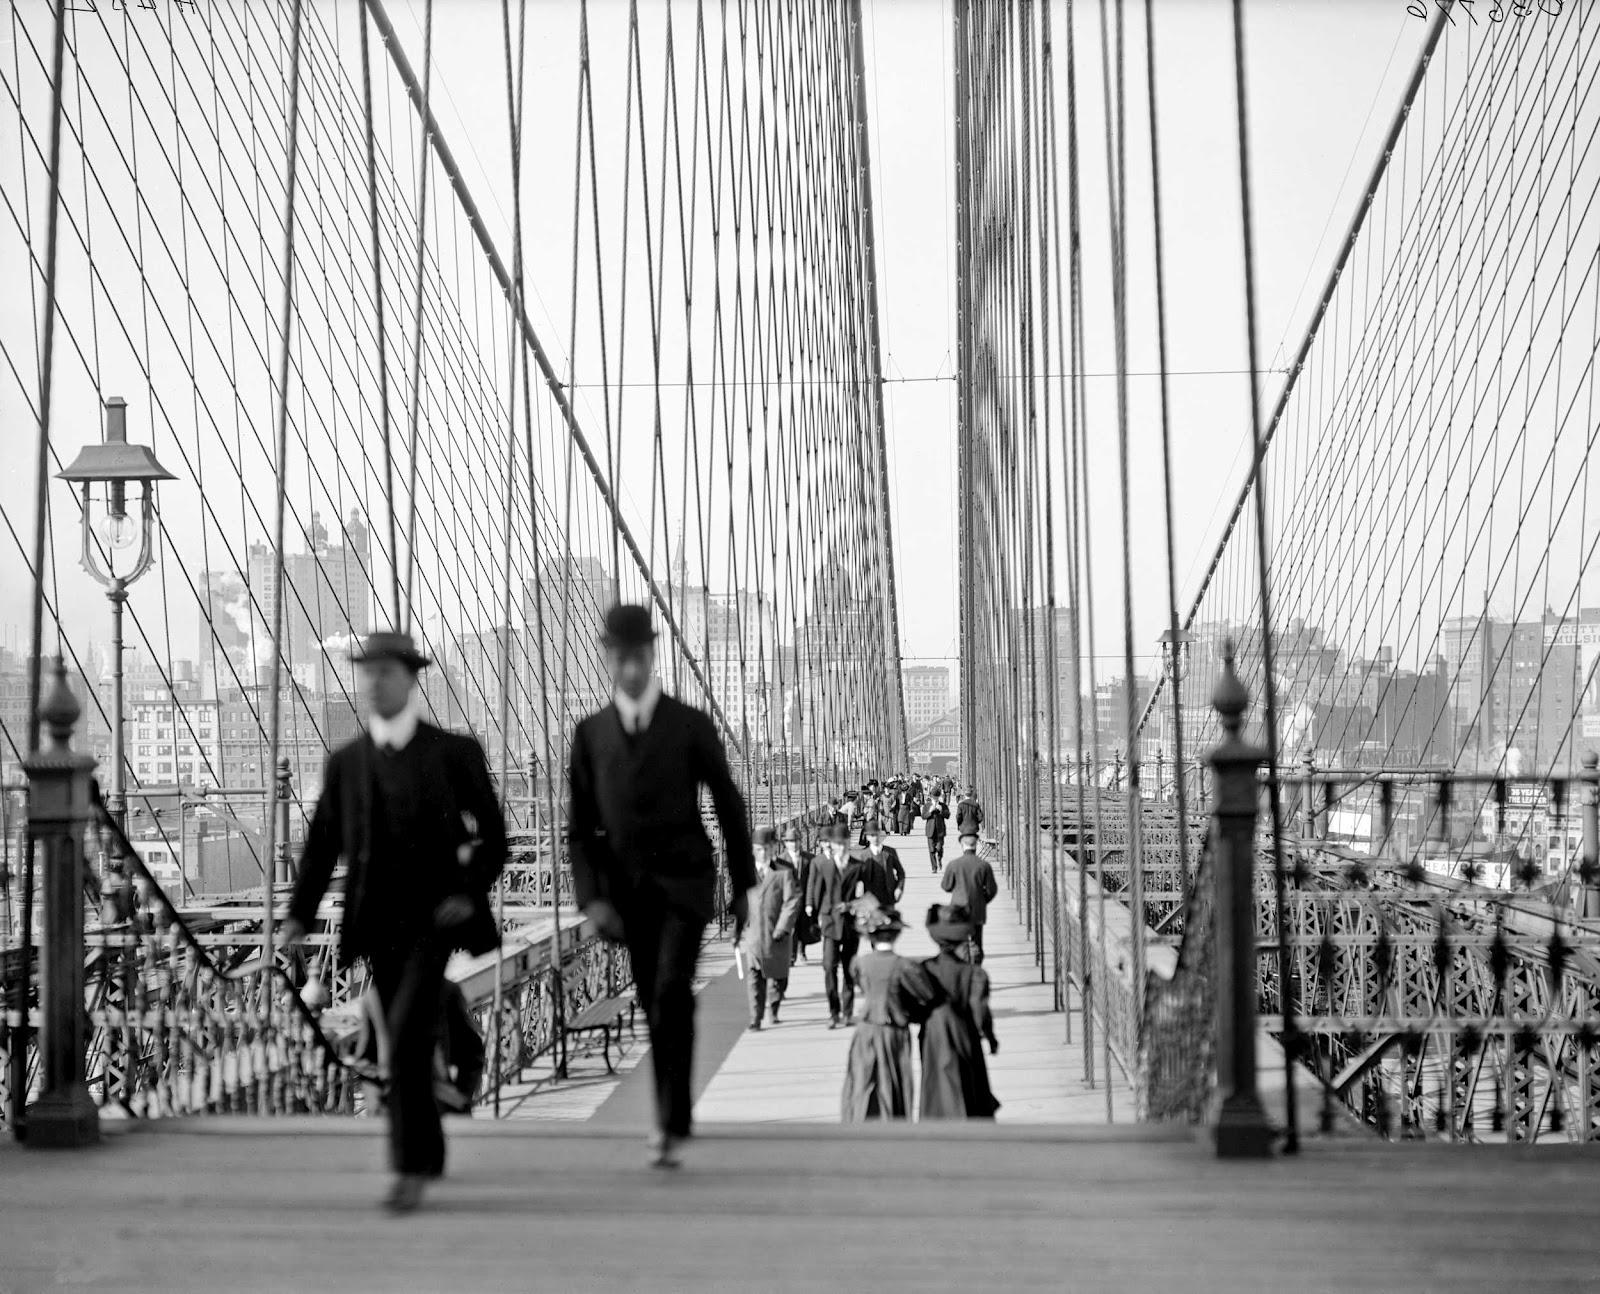 Brooklyn bridge new york 1905 1920